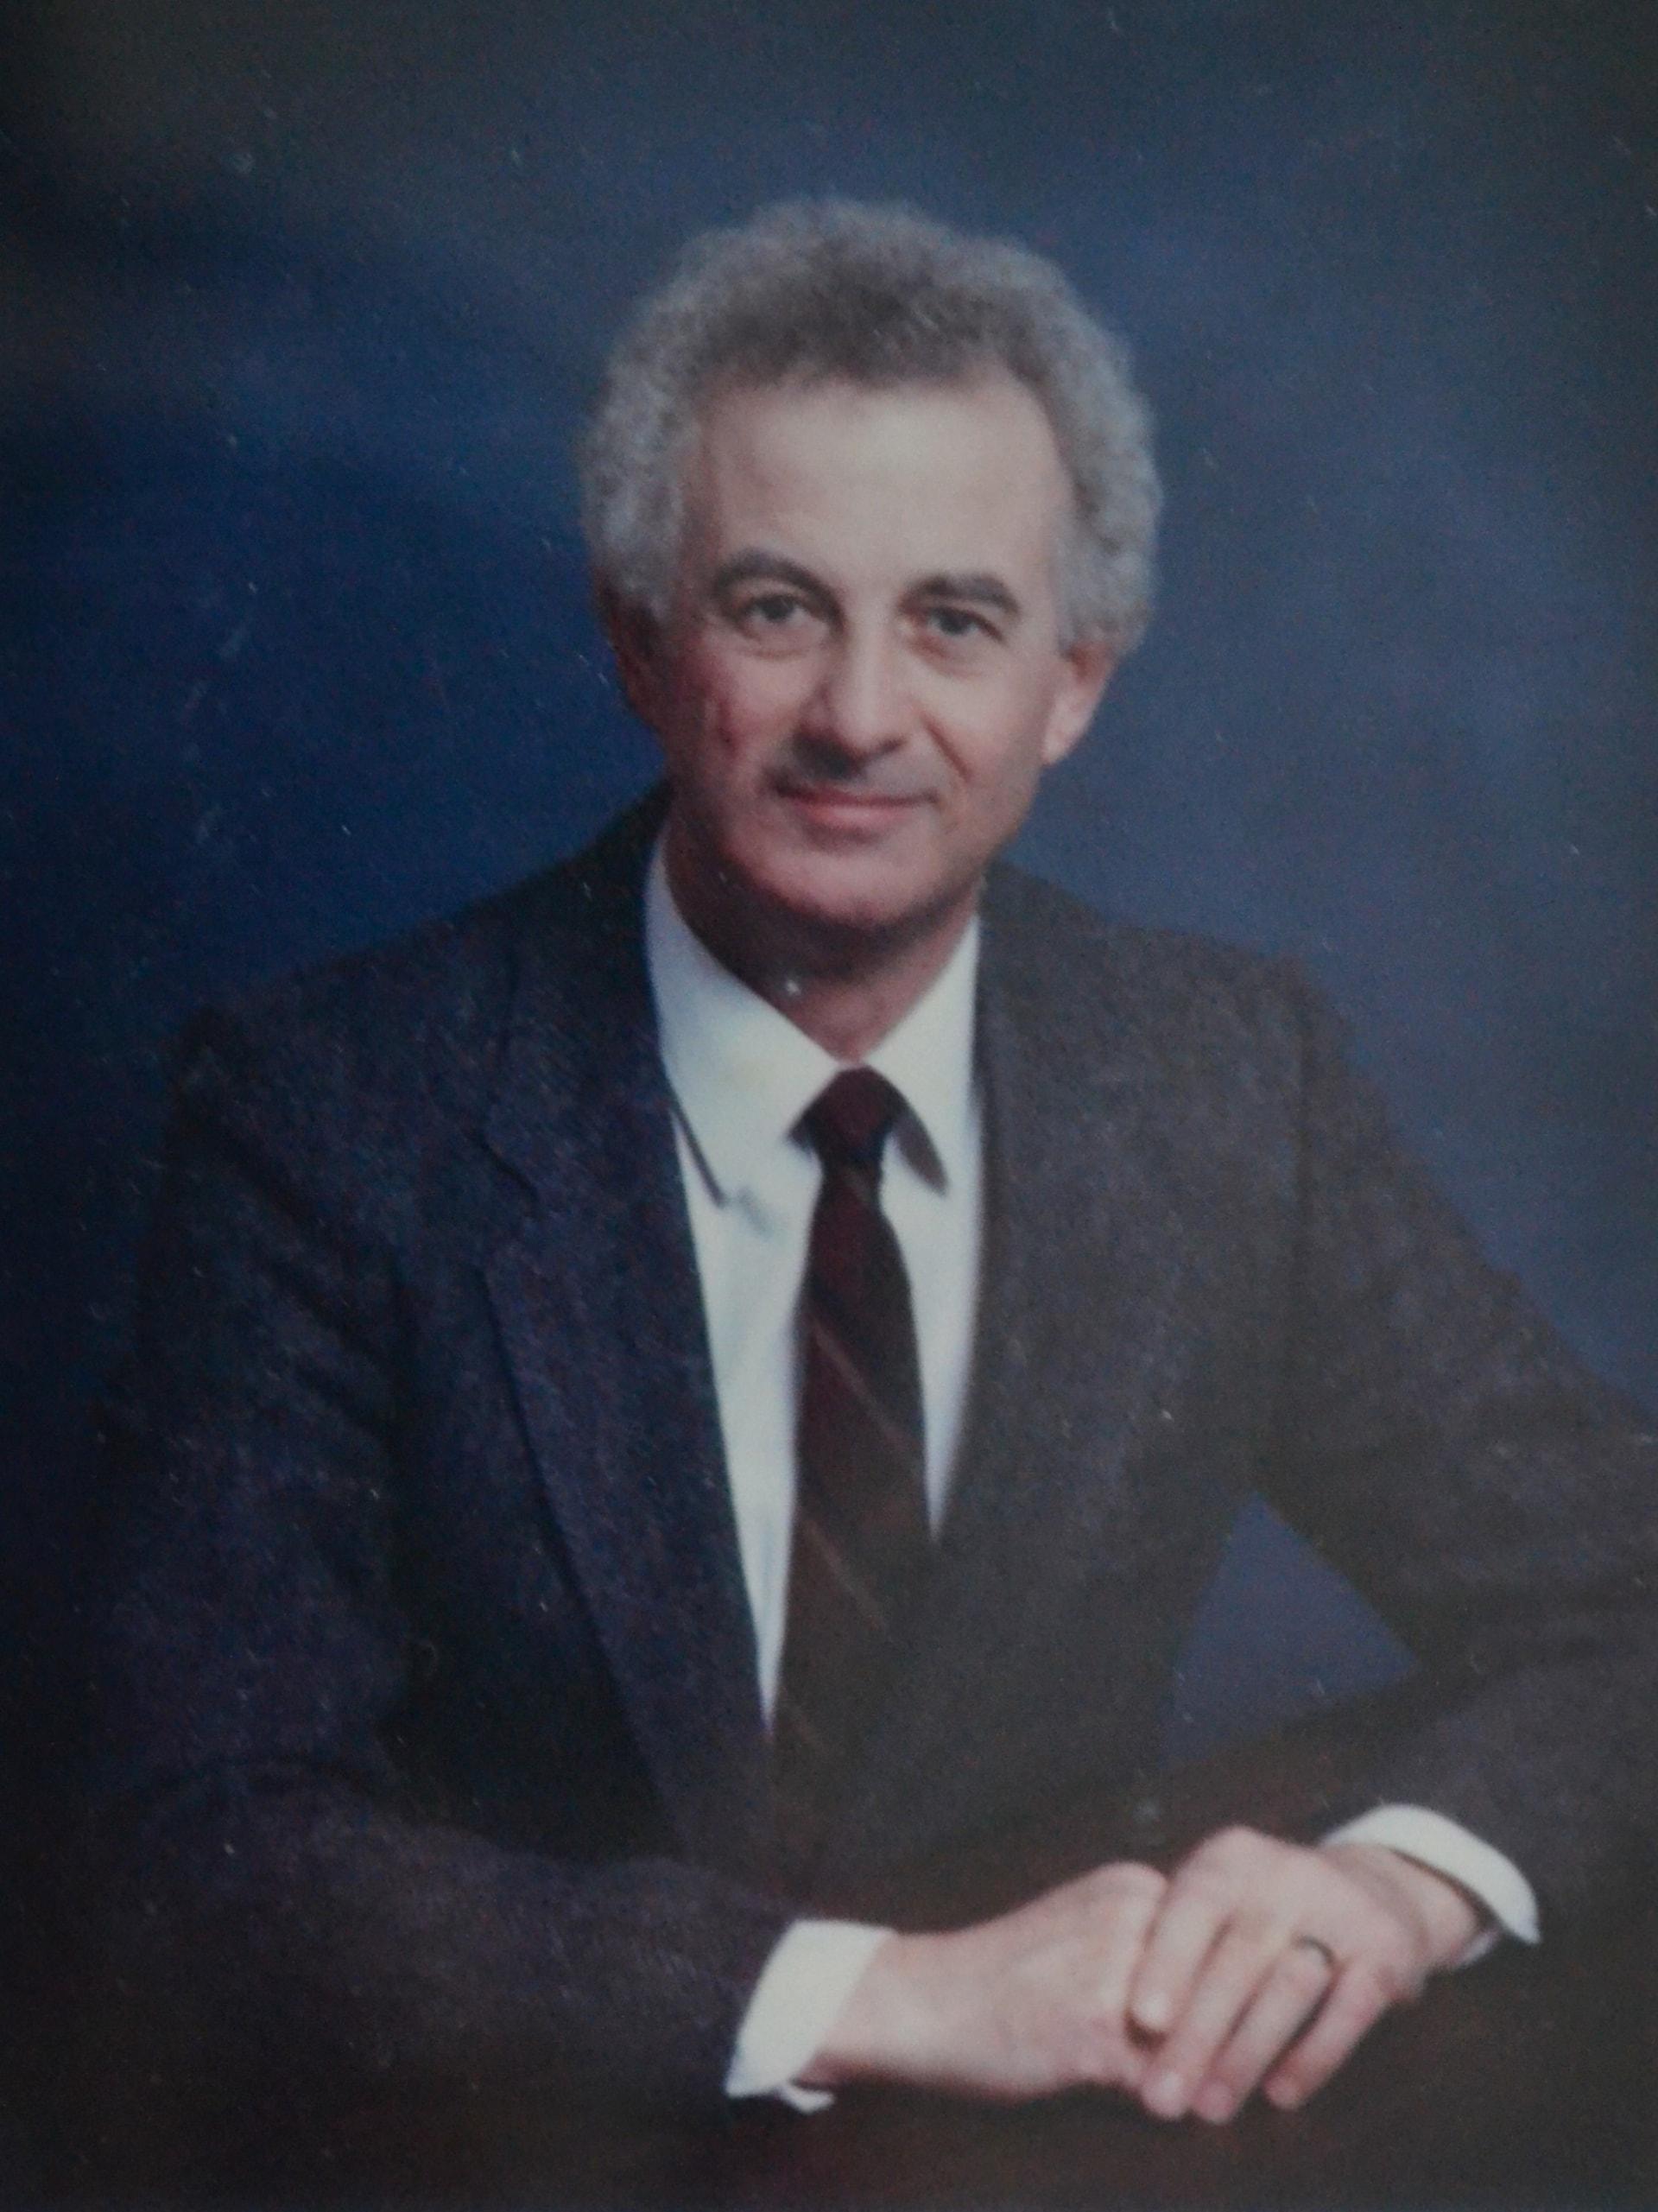 1986-Mike-Hammond.1-w1920.jpg